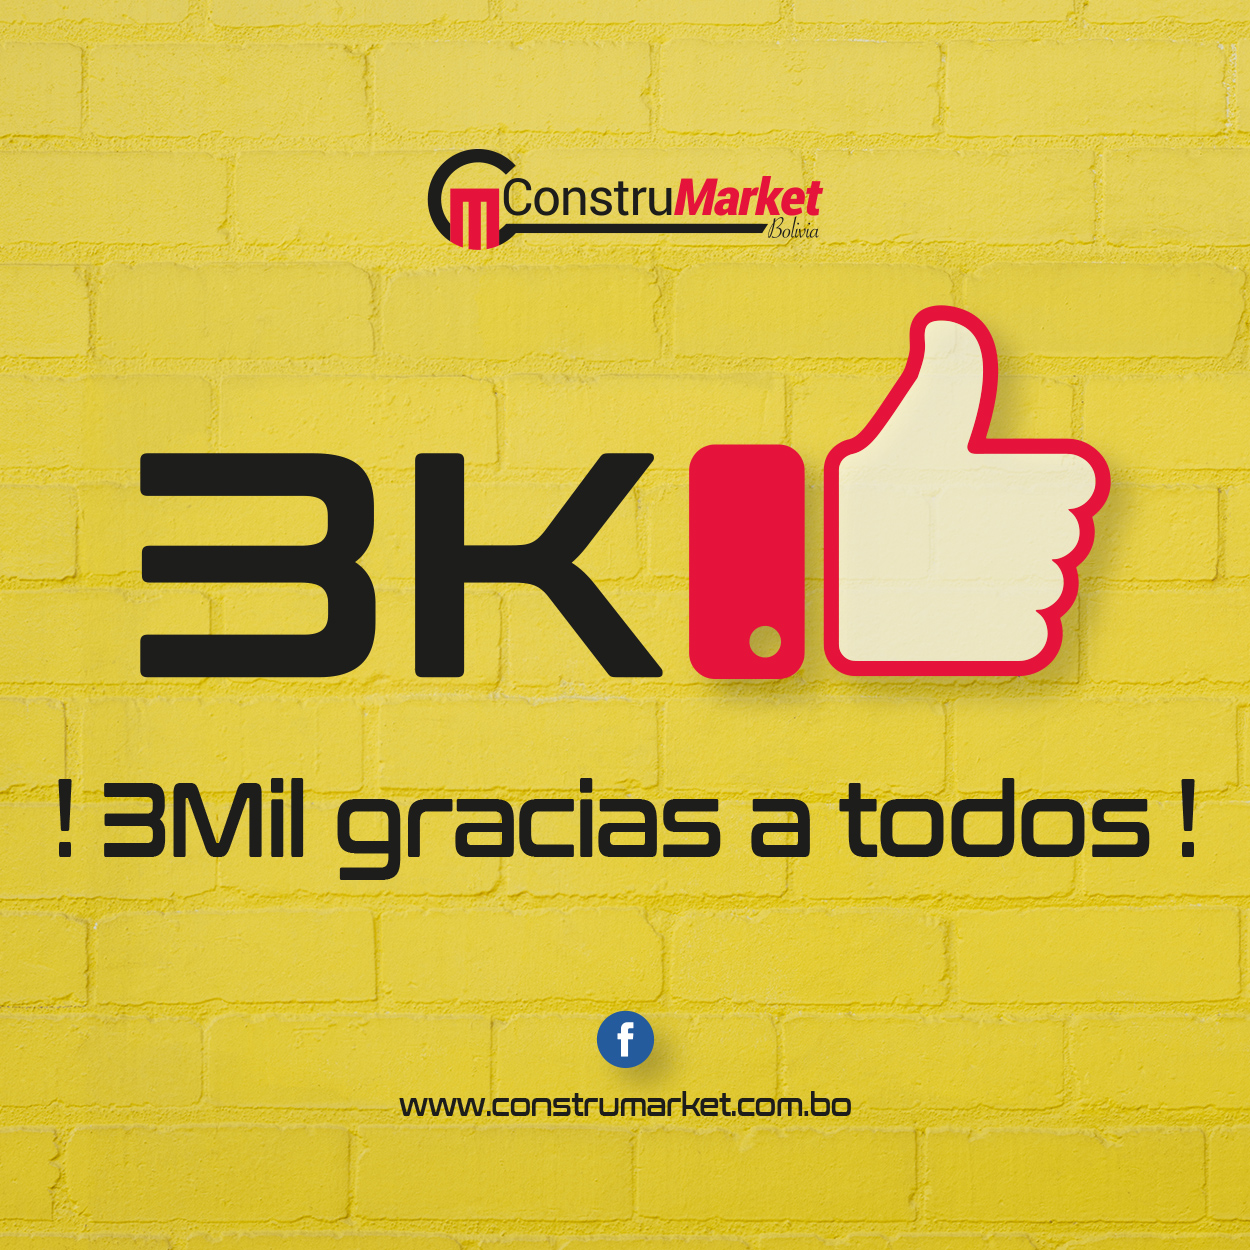 ¡3Mil gracias a todos!